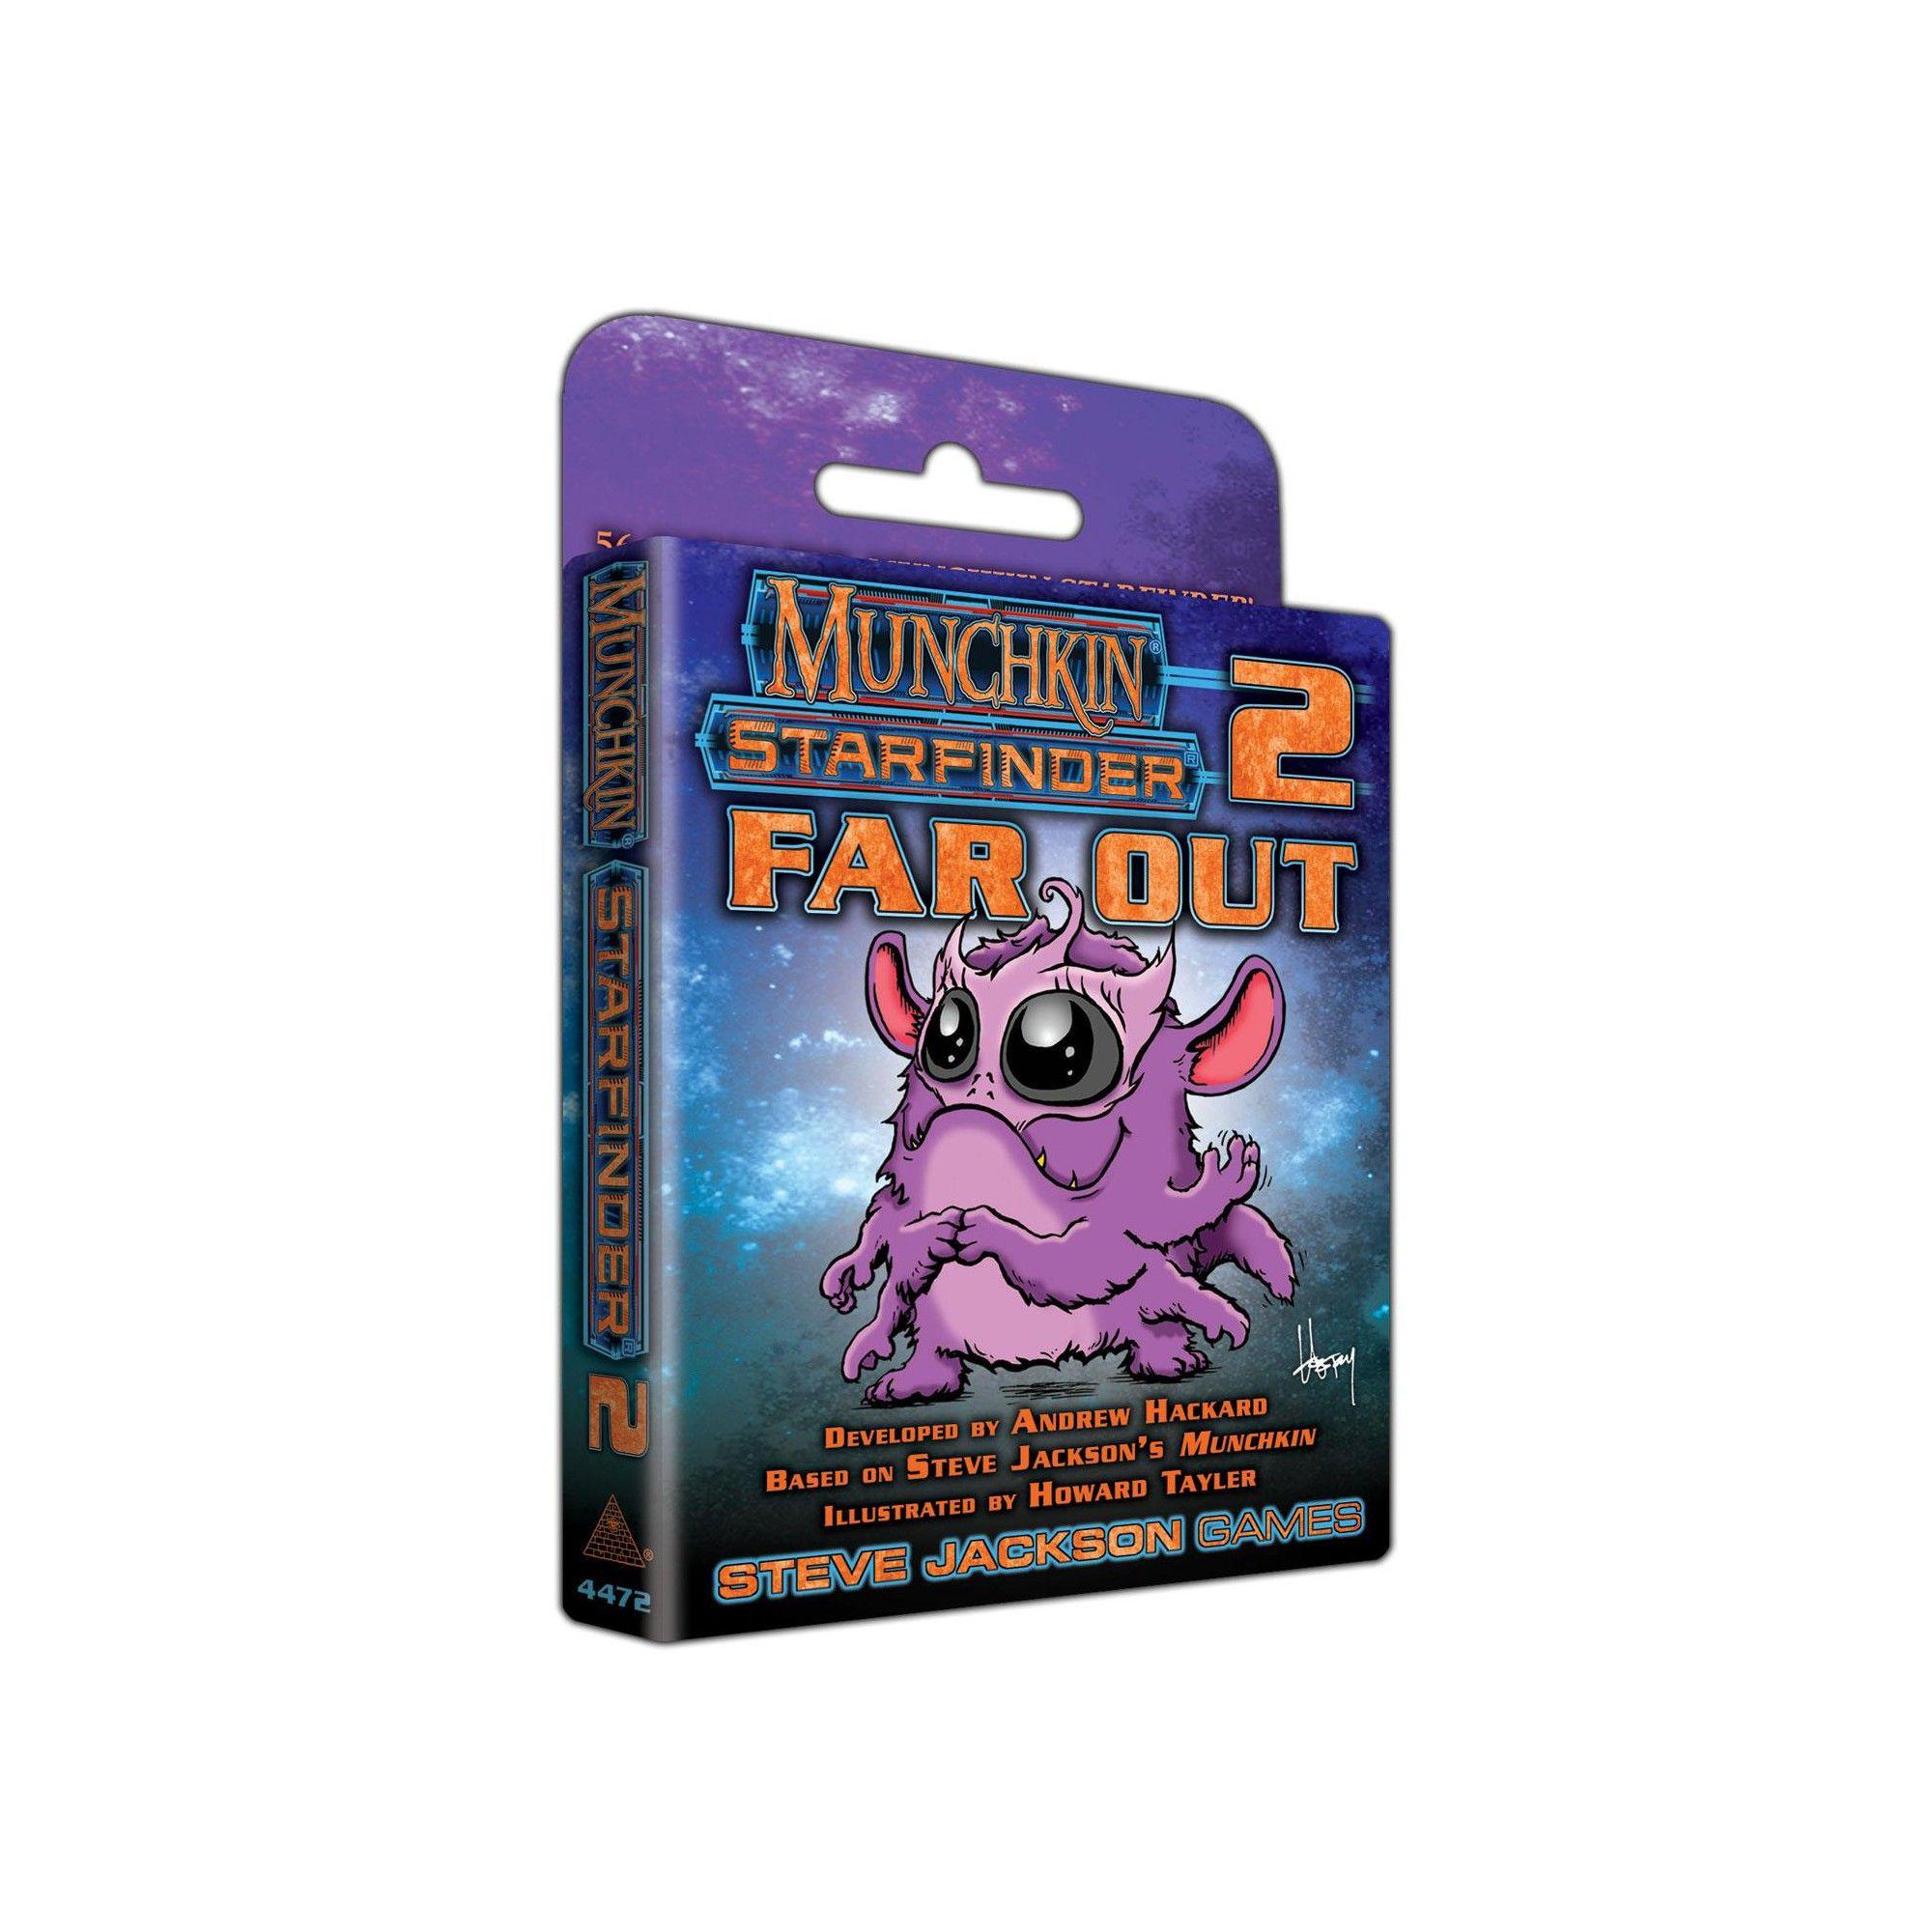 Munchkin Starfinder 2 Far Out Board Game Board Games Games